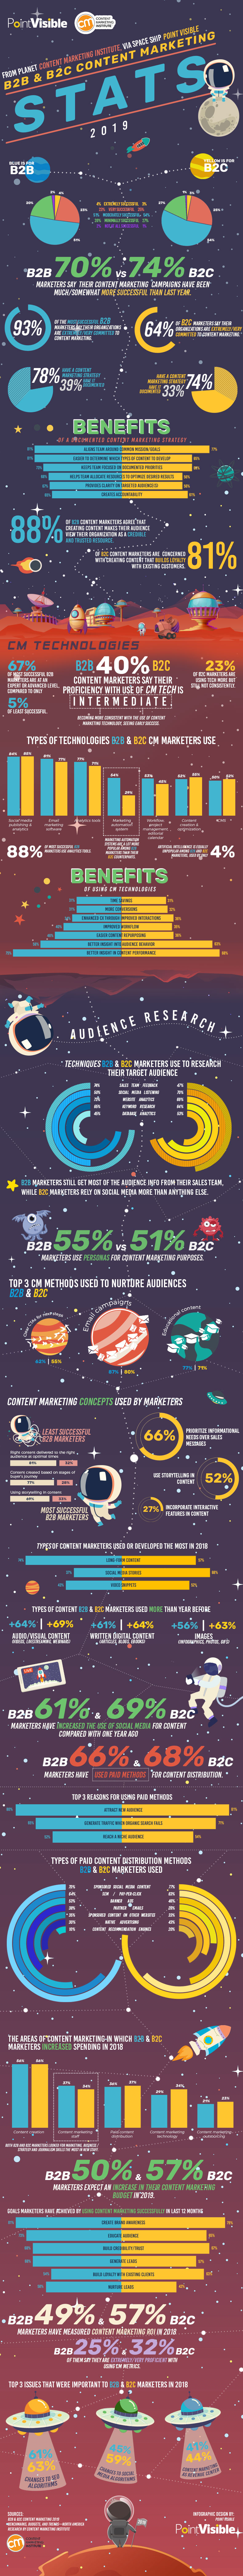 B2B-B2C-CM-stats-2019-infographic